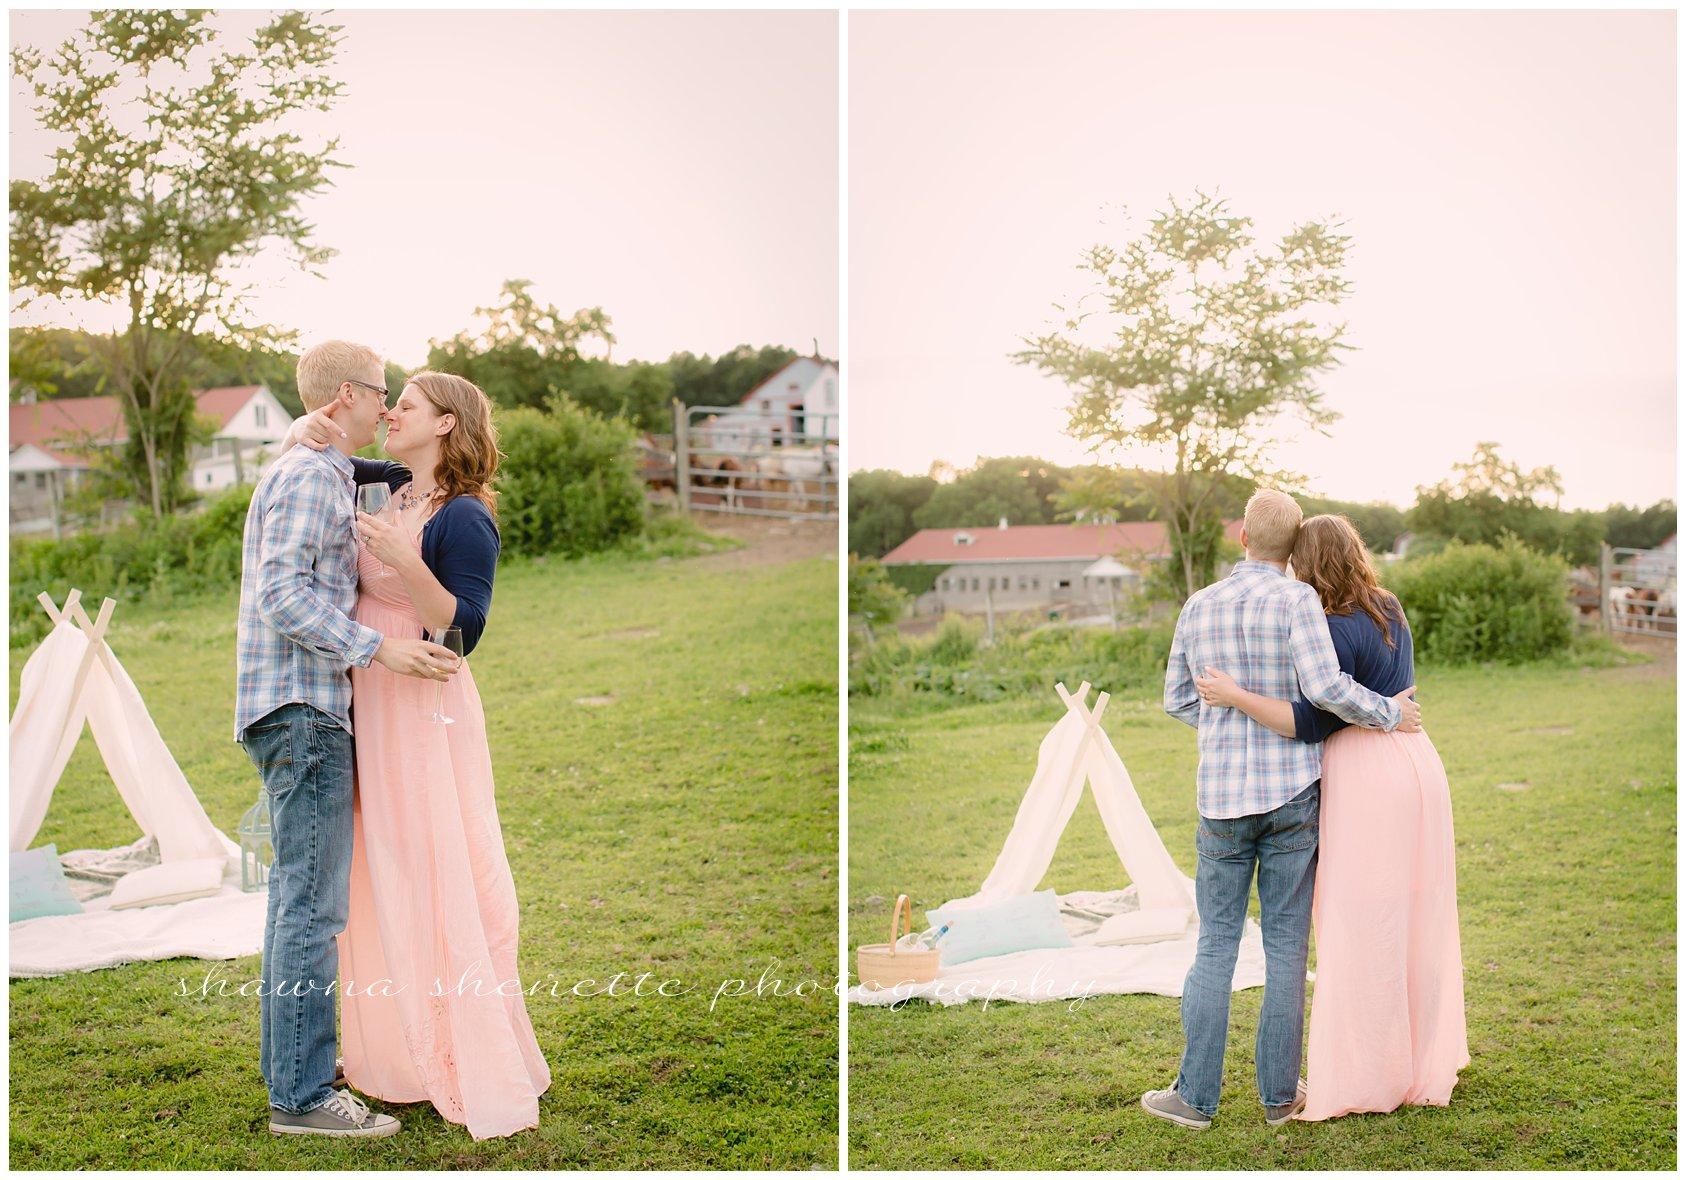 Massachusetts Engagement Wedding Photographer Worcester Millbury Couples Photos Best In Massachusetts Farm Engagement Photos_165